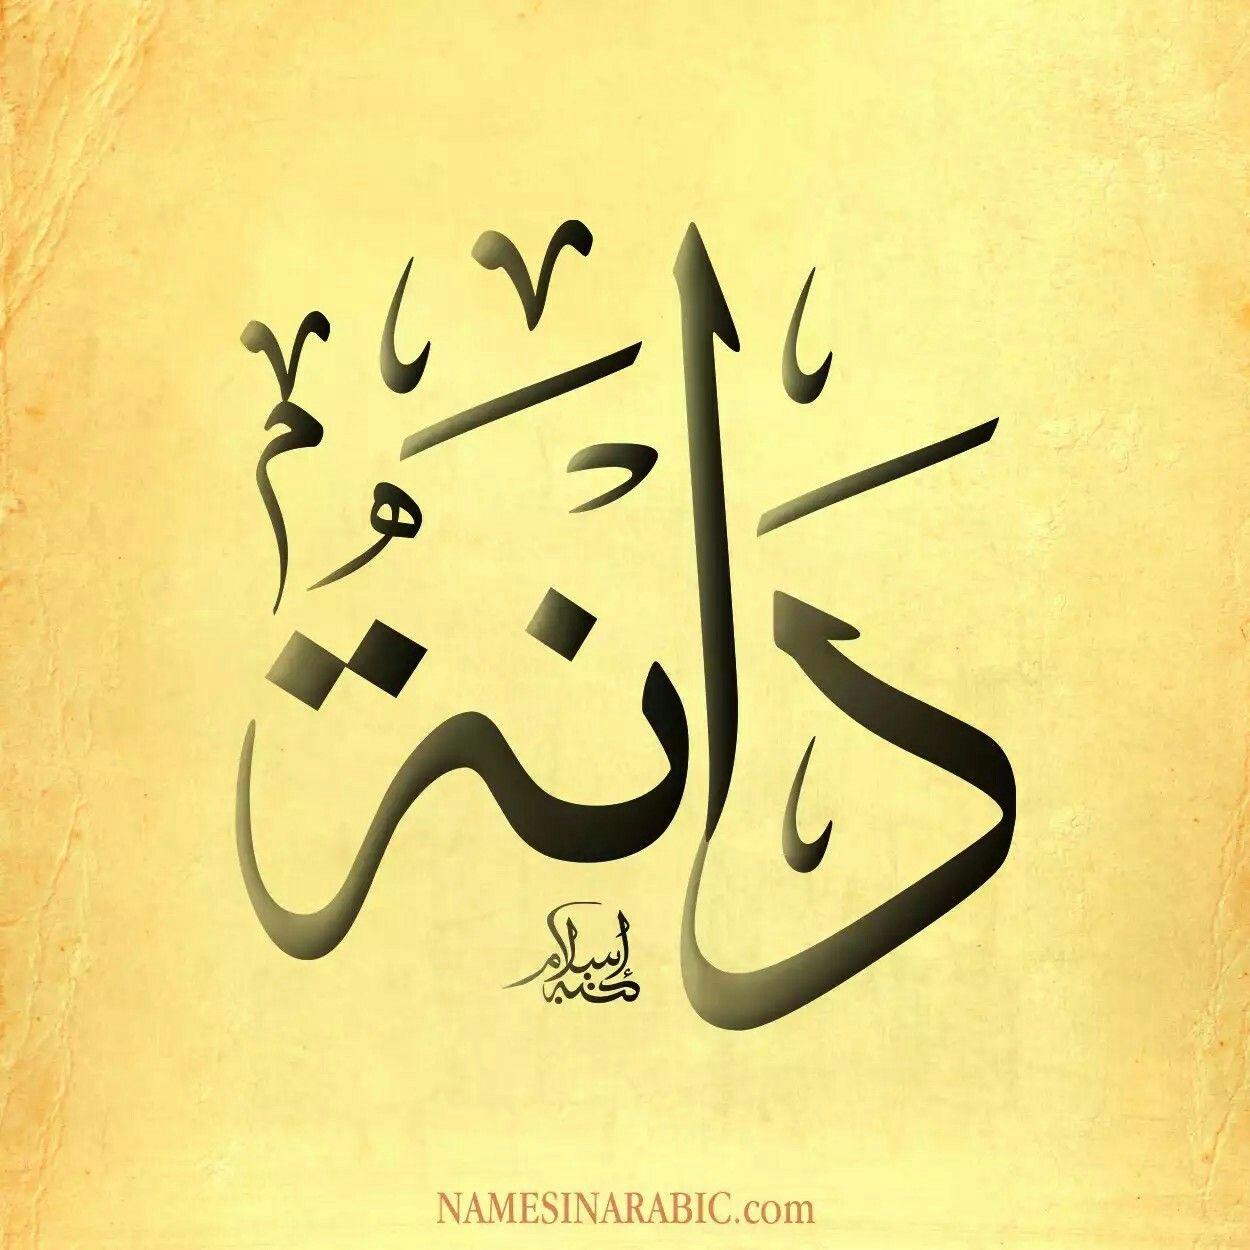 Pin By Mahmoud Bin Yousef On اسماء Calligraphy Name Arabic Calligraphy Calligraphy